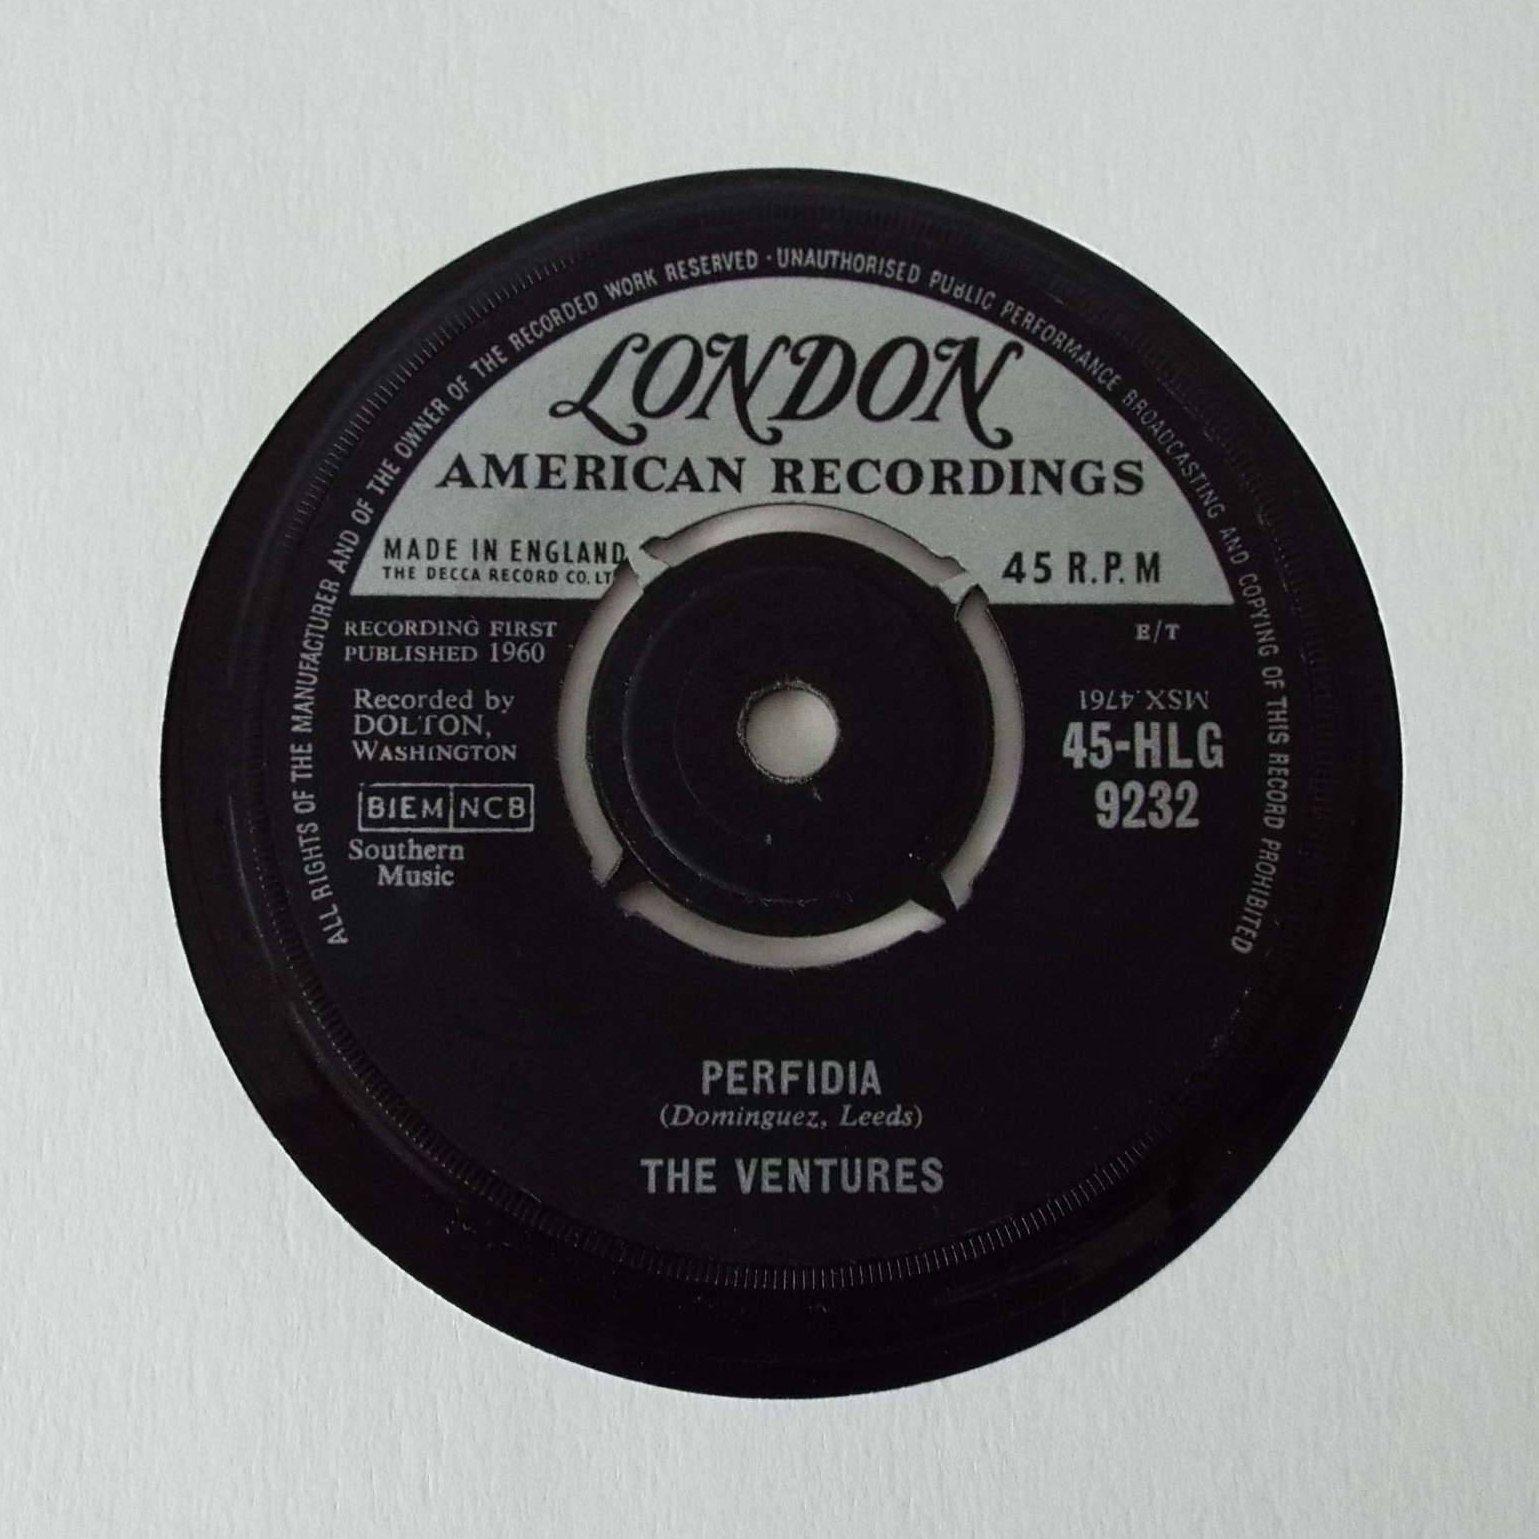 Vintage 1960 The Ventures Perfidia No Trespassing 7